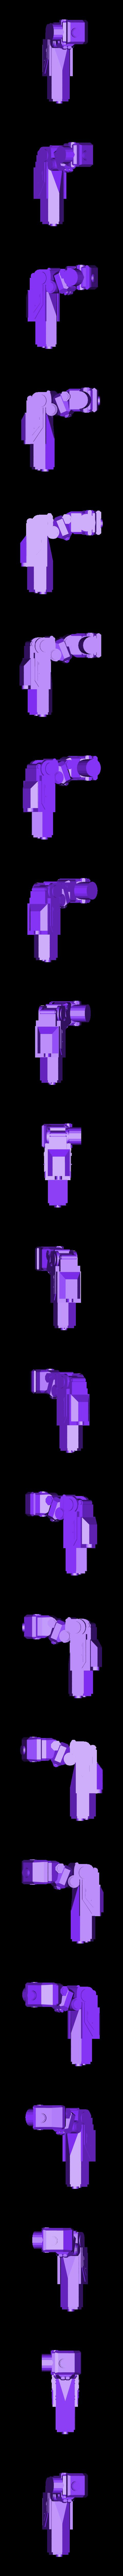 Linebacker_Right_Arm.stl Download free STL file MechWarrior Linebacker • 3D printable model, mrhers2